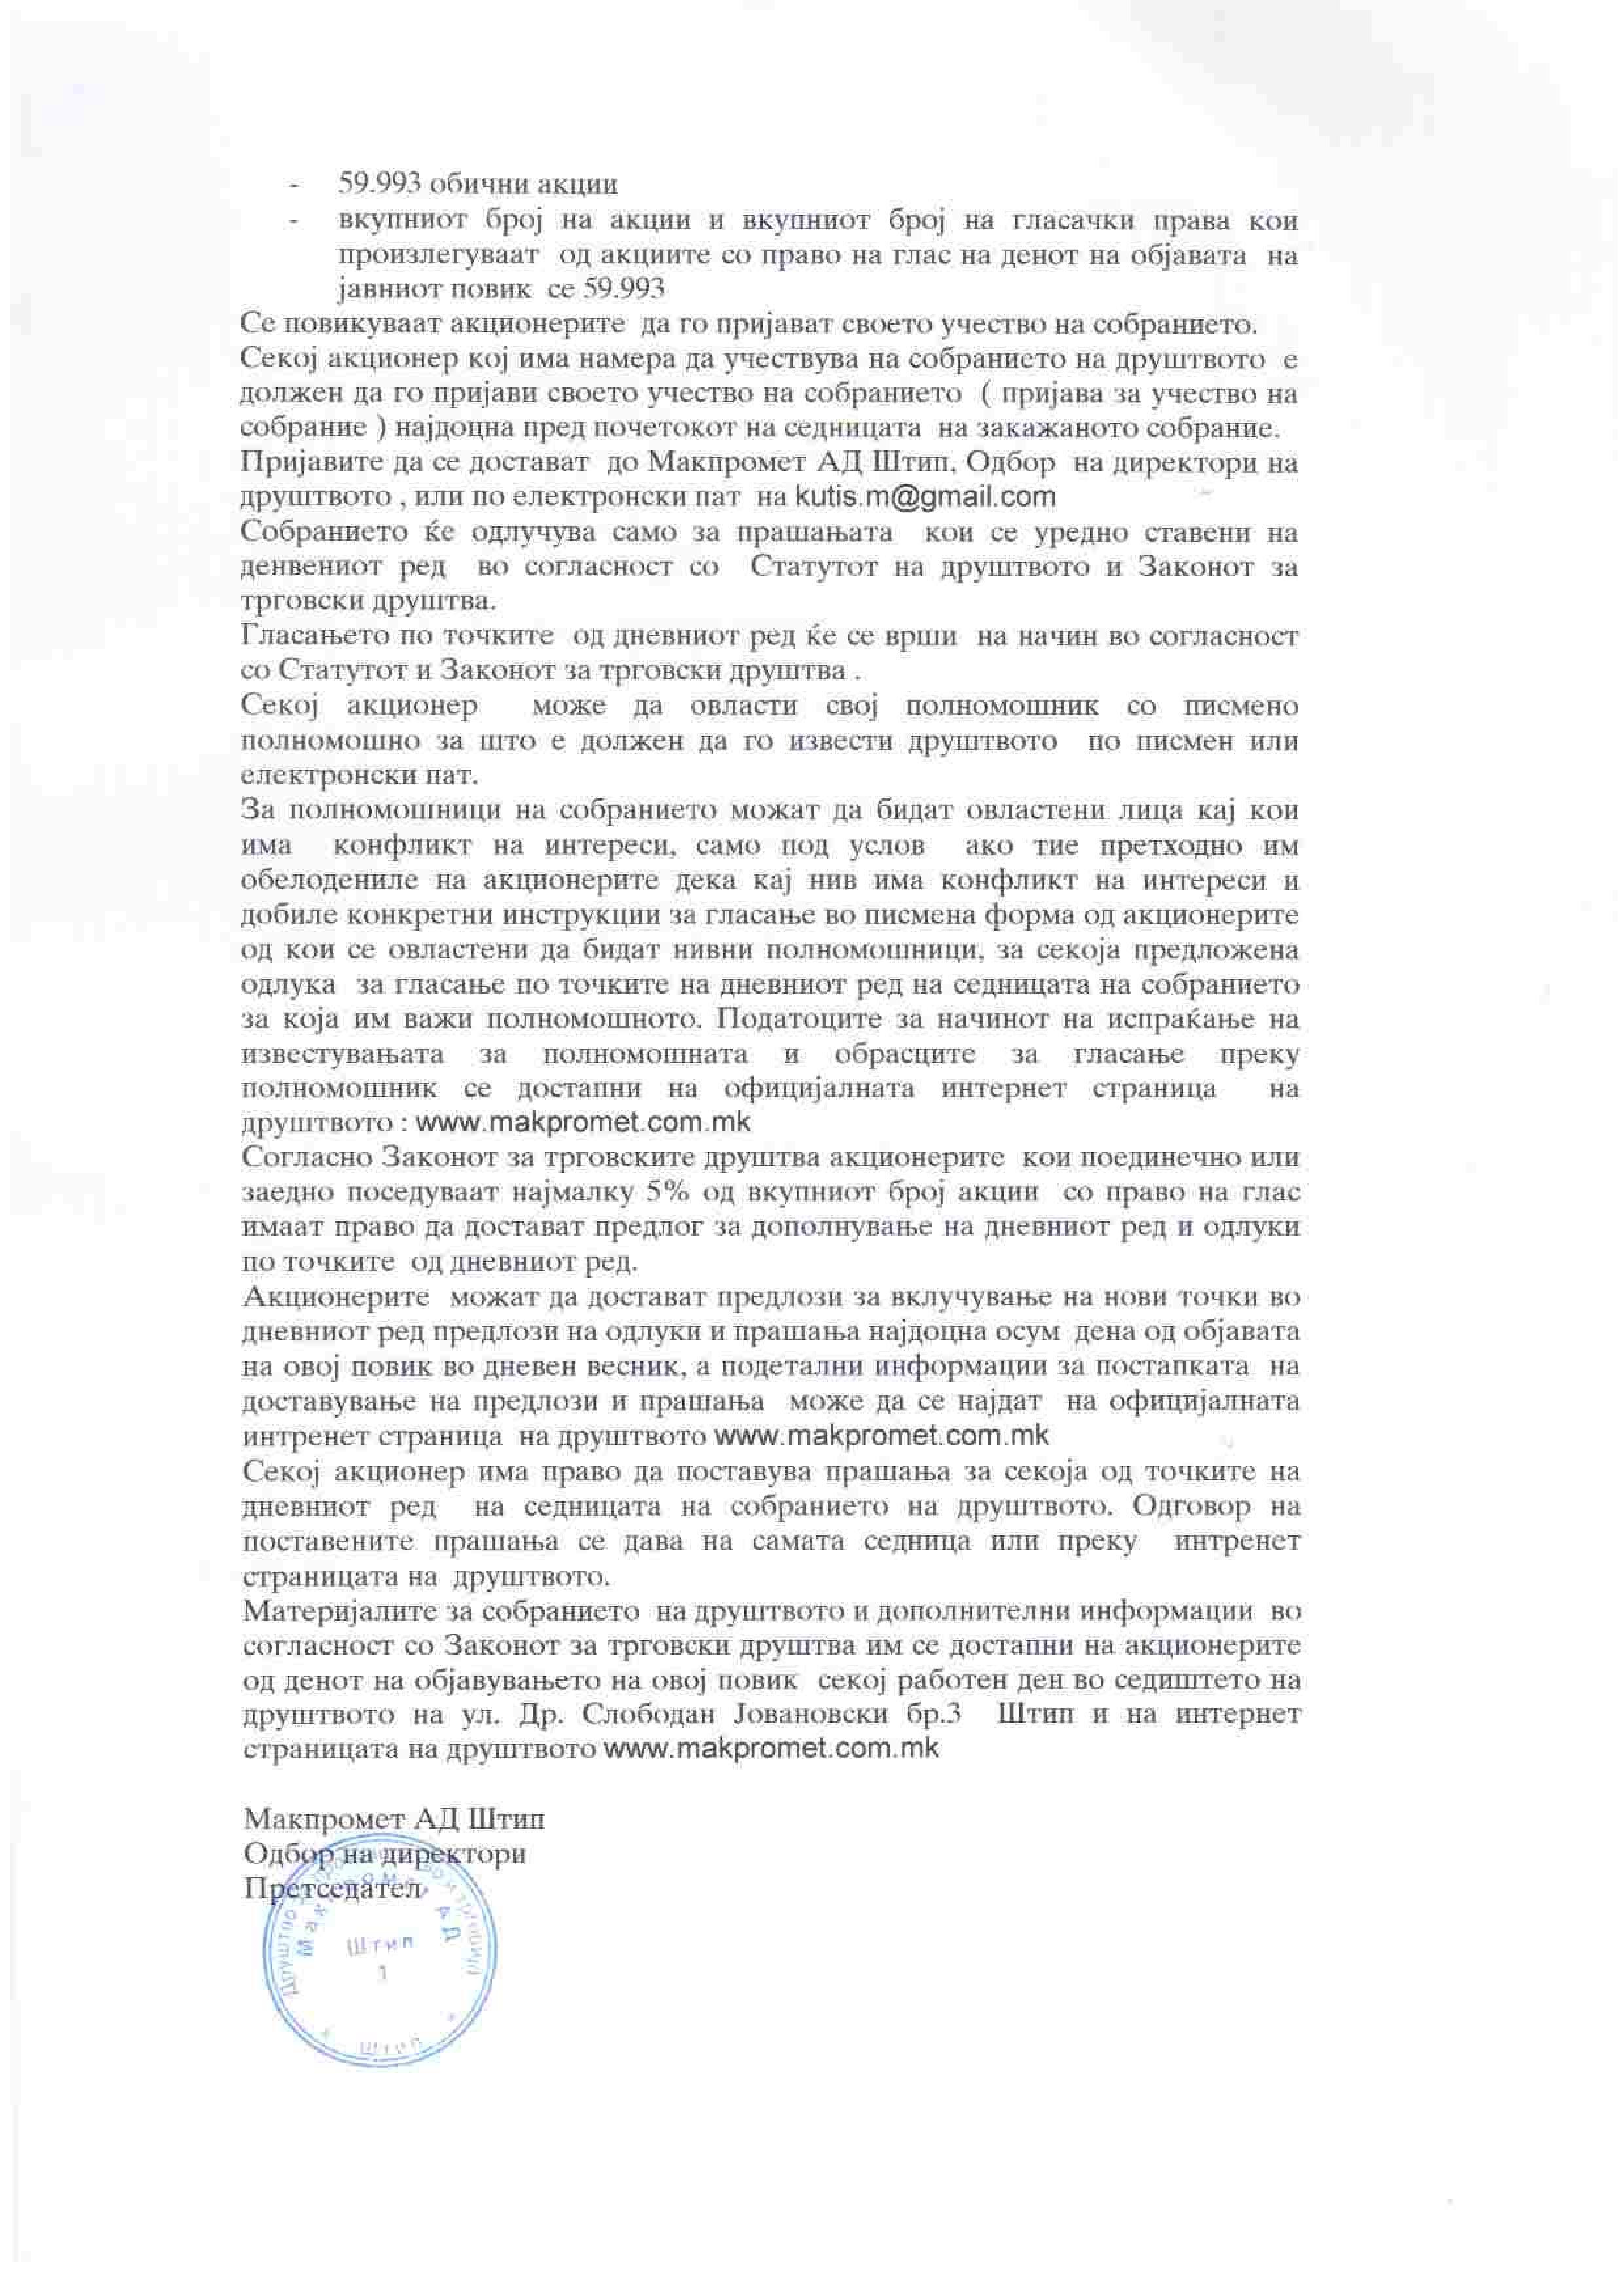 Povik za sobranie na akcioneri (2) 14.10.15